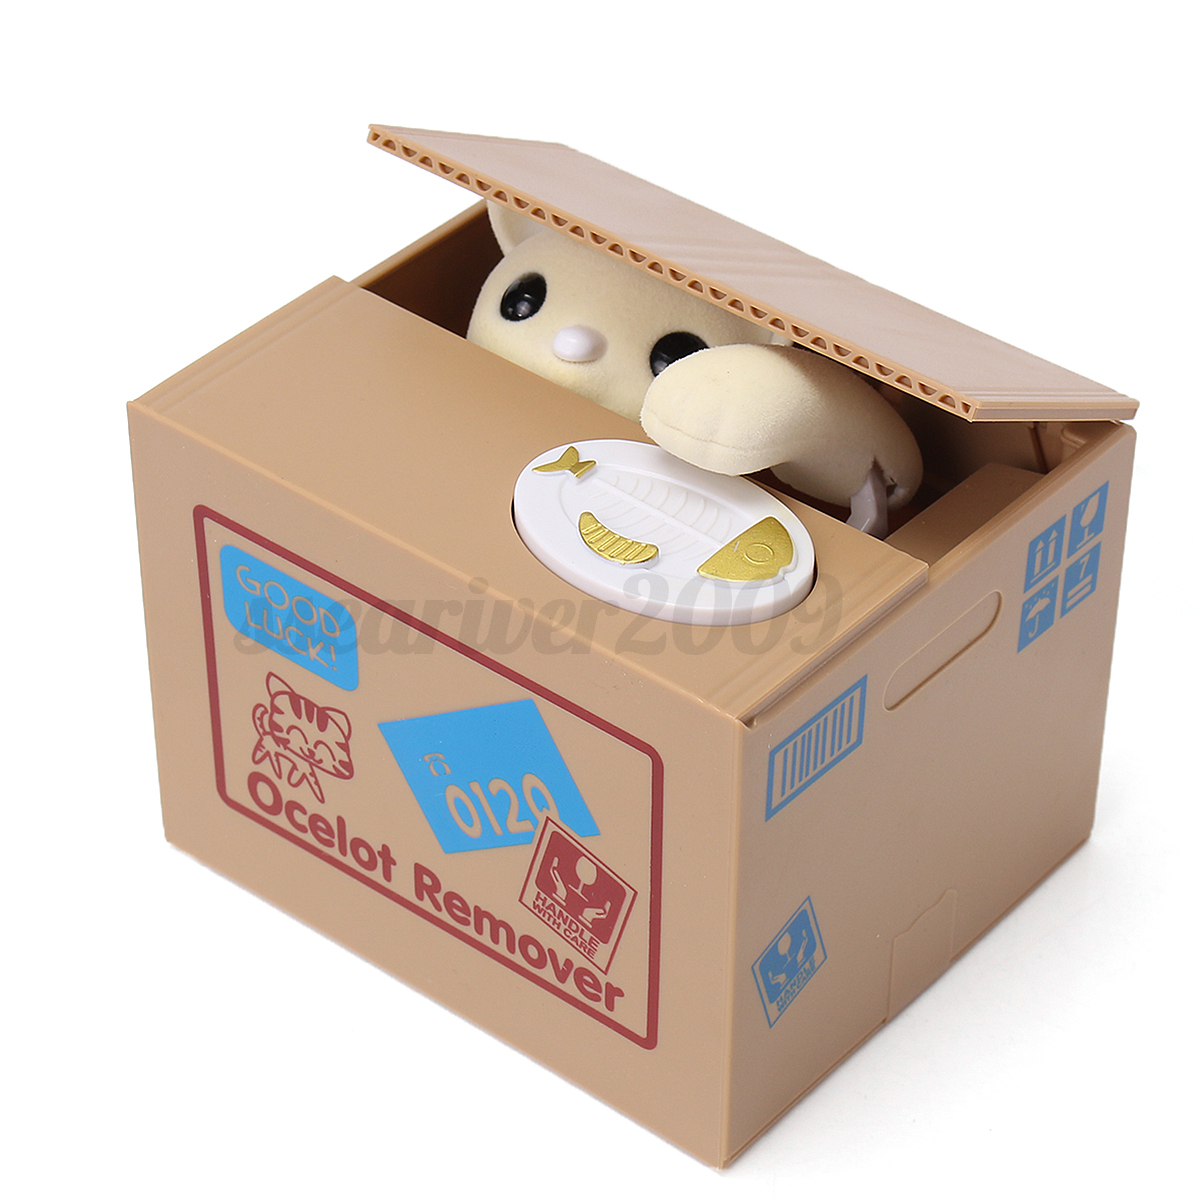 chat chien coin piggy bank tirelire pargner argent saving box pr enfant cadeau ebay. Black Bedroom Furniture Sets. Home Design Ideas